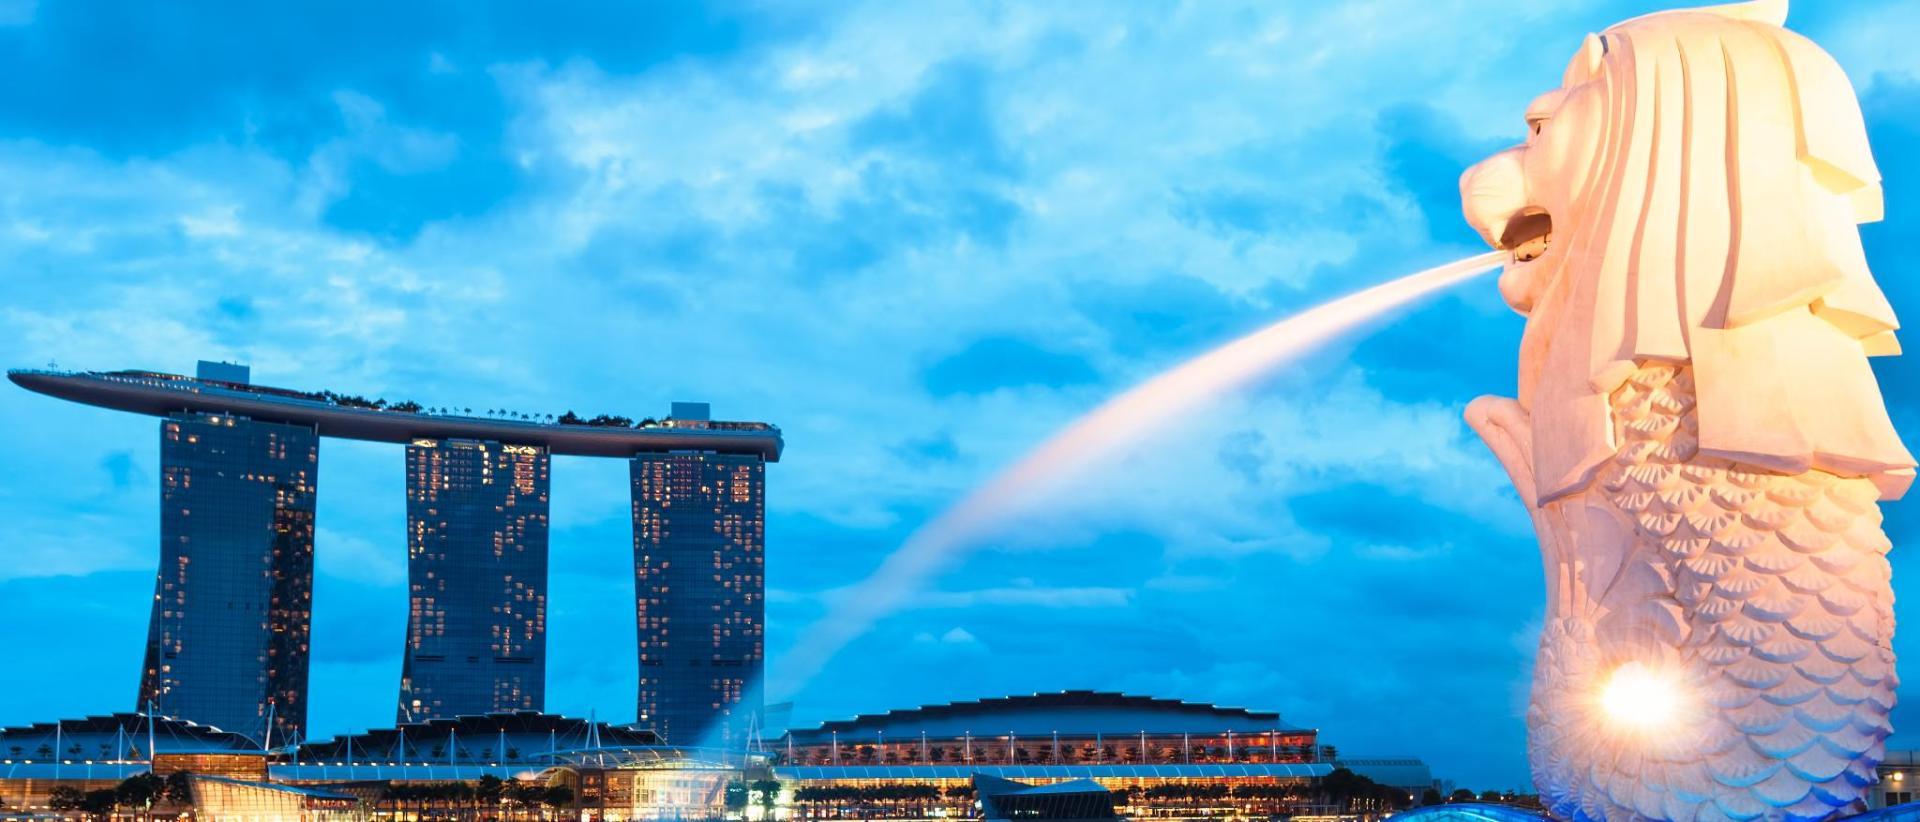 Hotels near Sentosa Island, Singapore - BEST HOTEL RATES